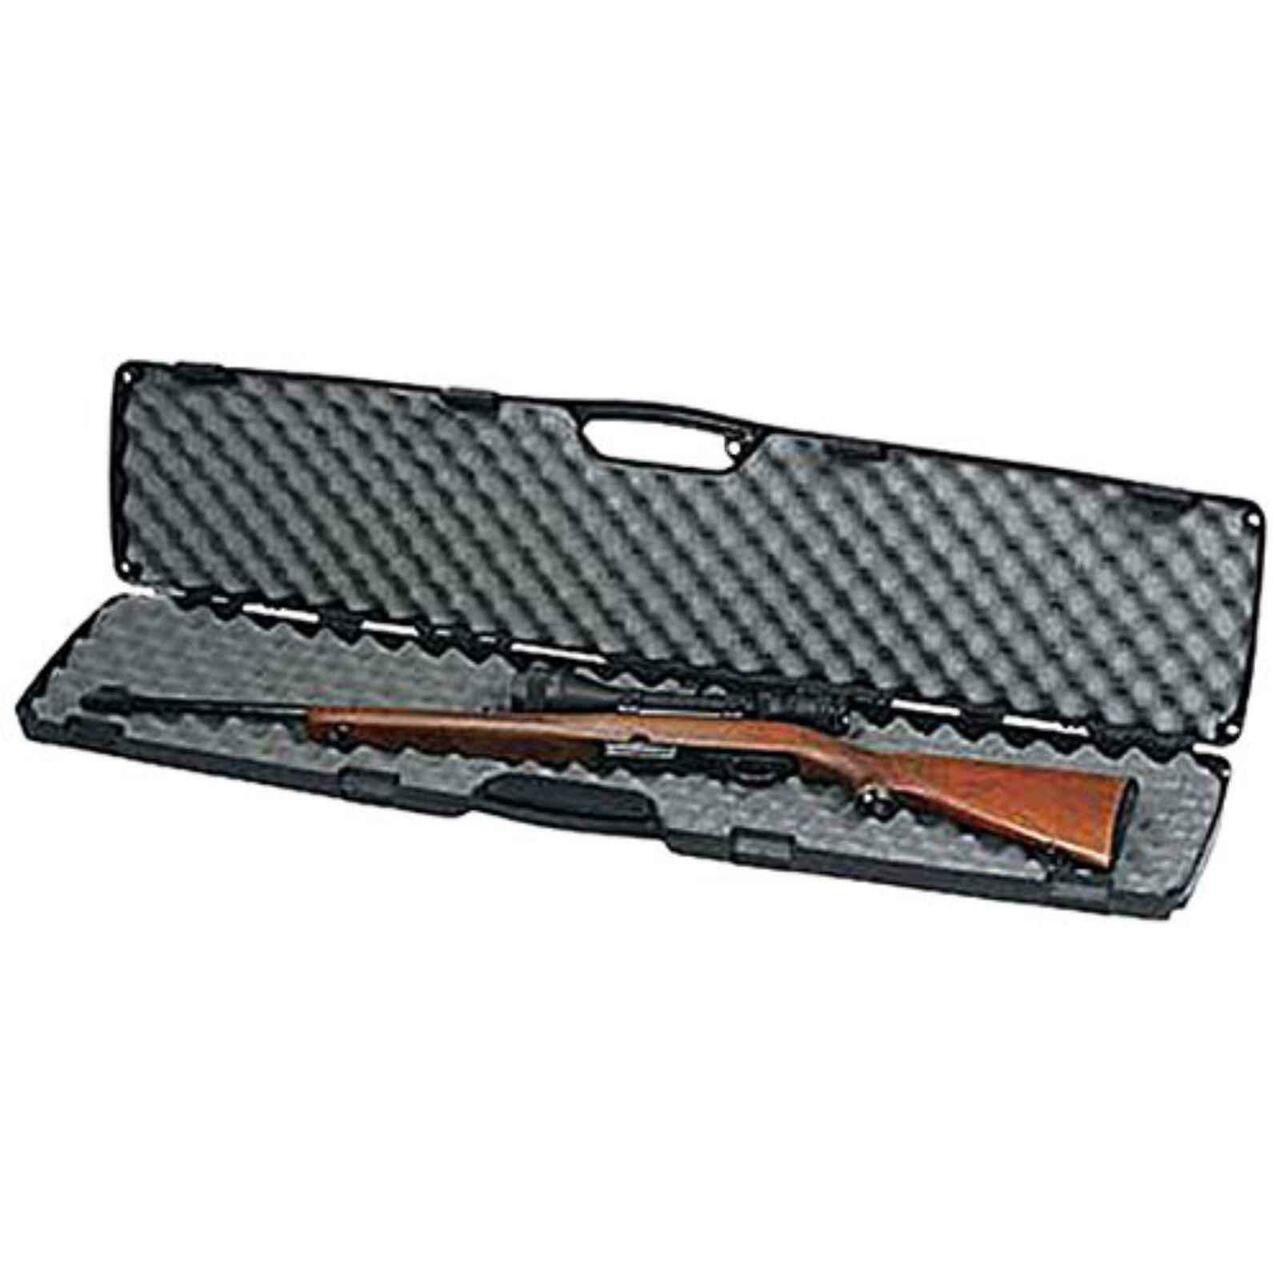 Plano Gun Case - SE Series Single Scoped Rifle